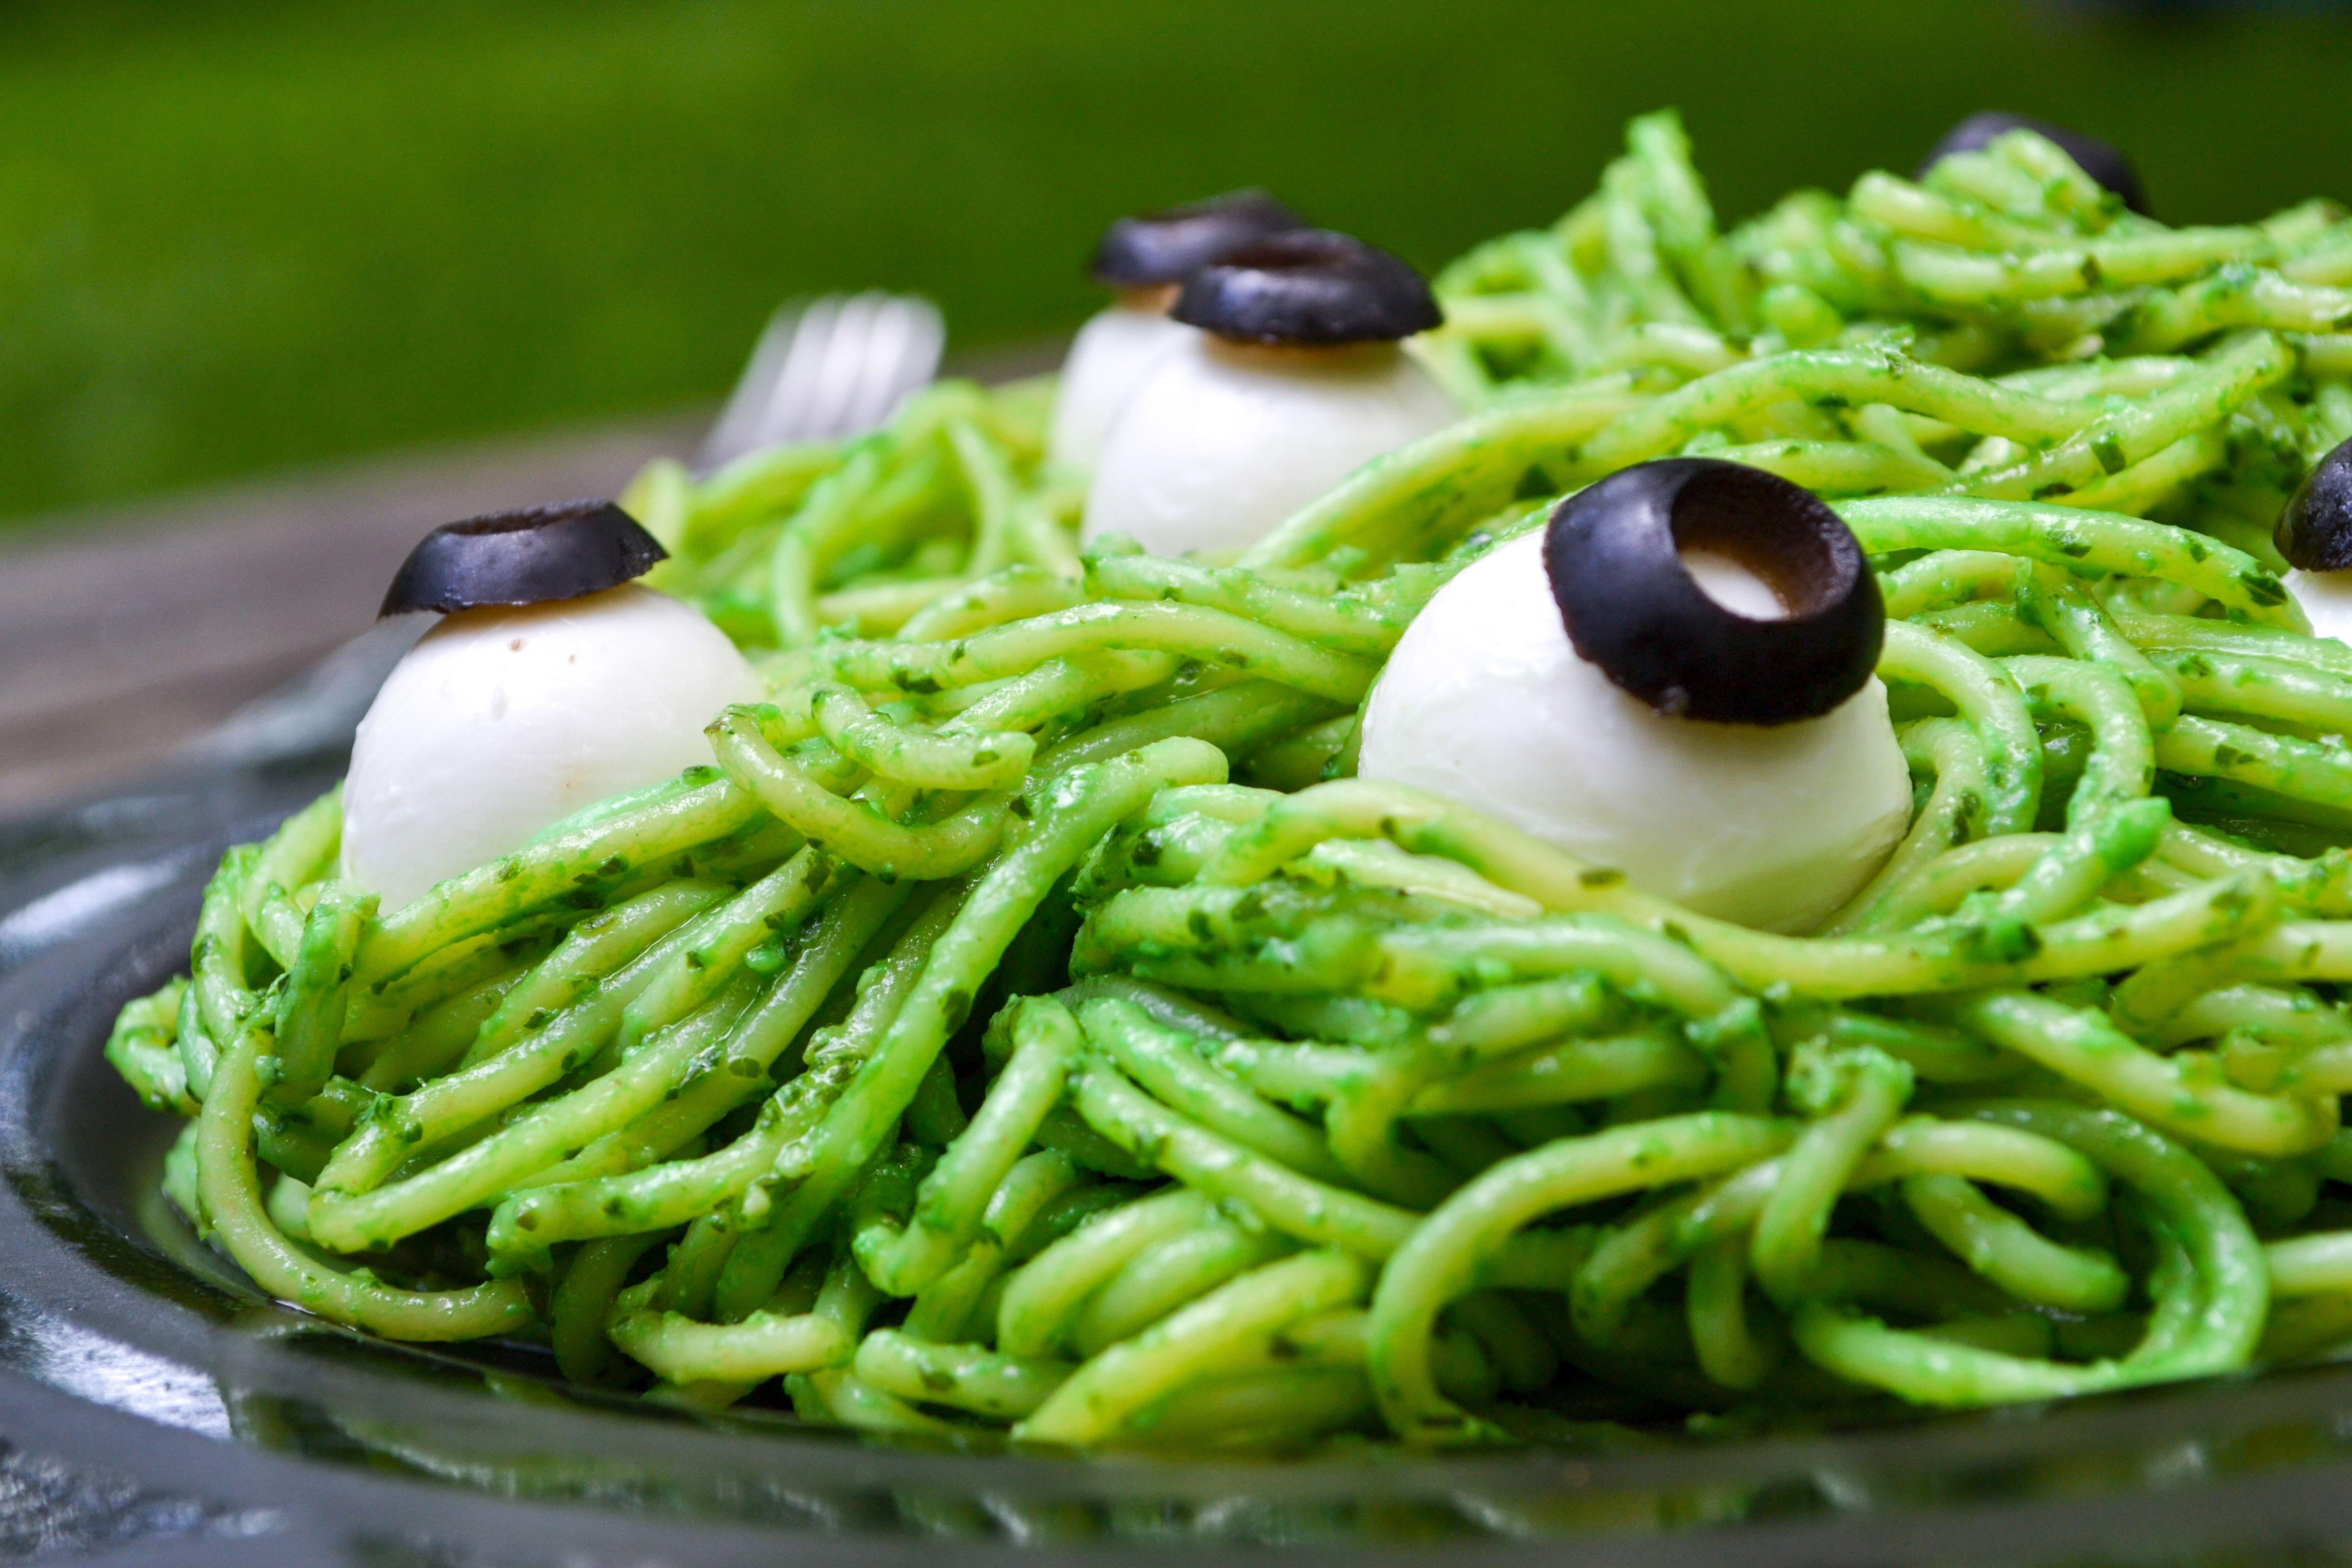 bright green spaghetti noodles covered in veggie pesto and topped with mozzarella eyeballs